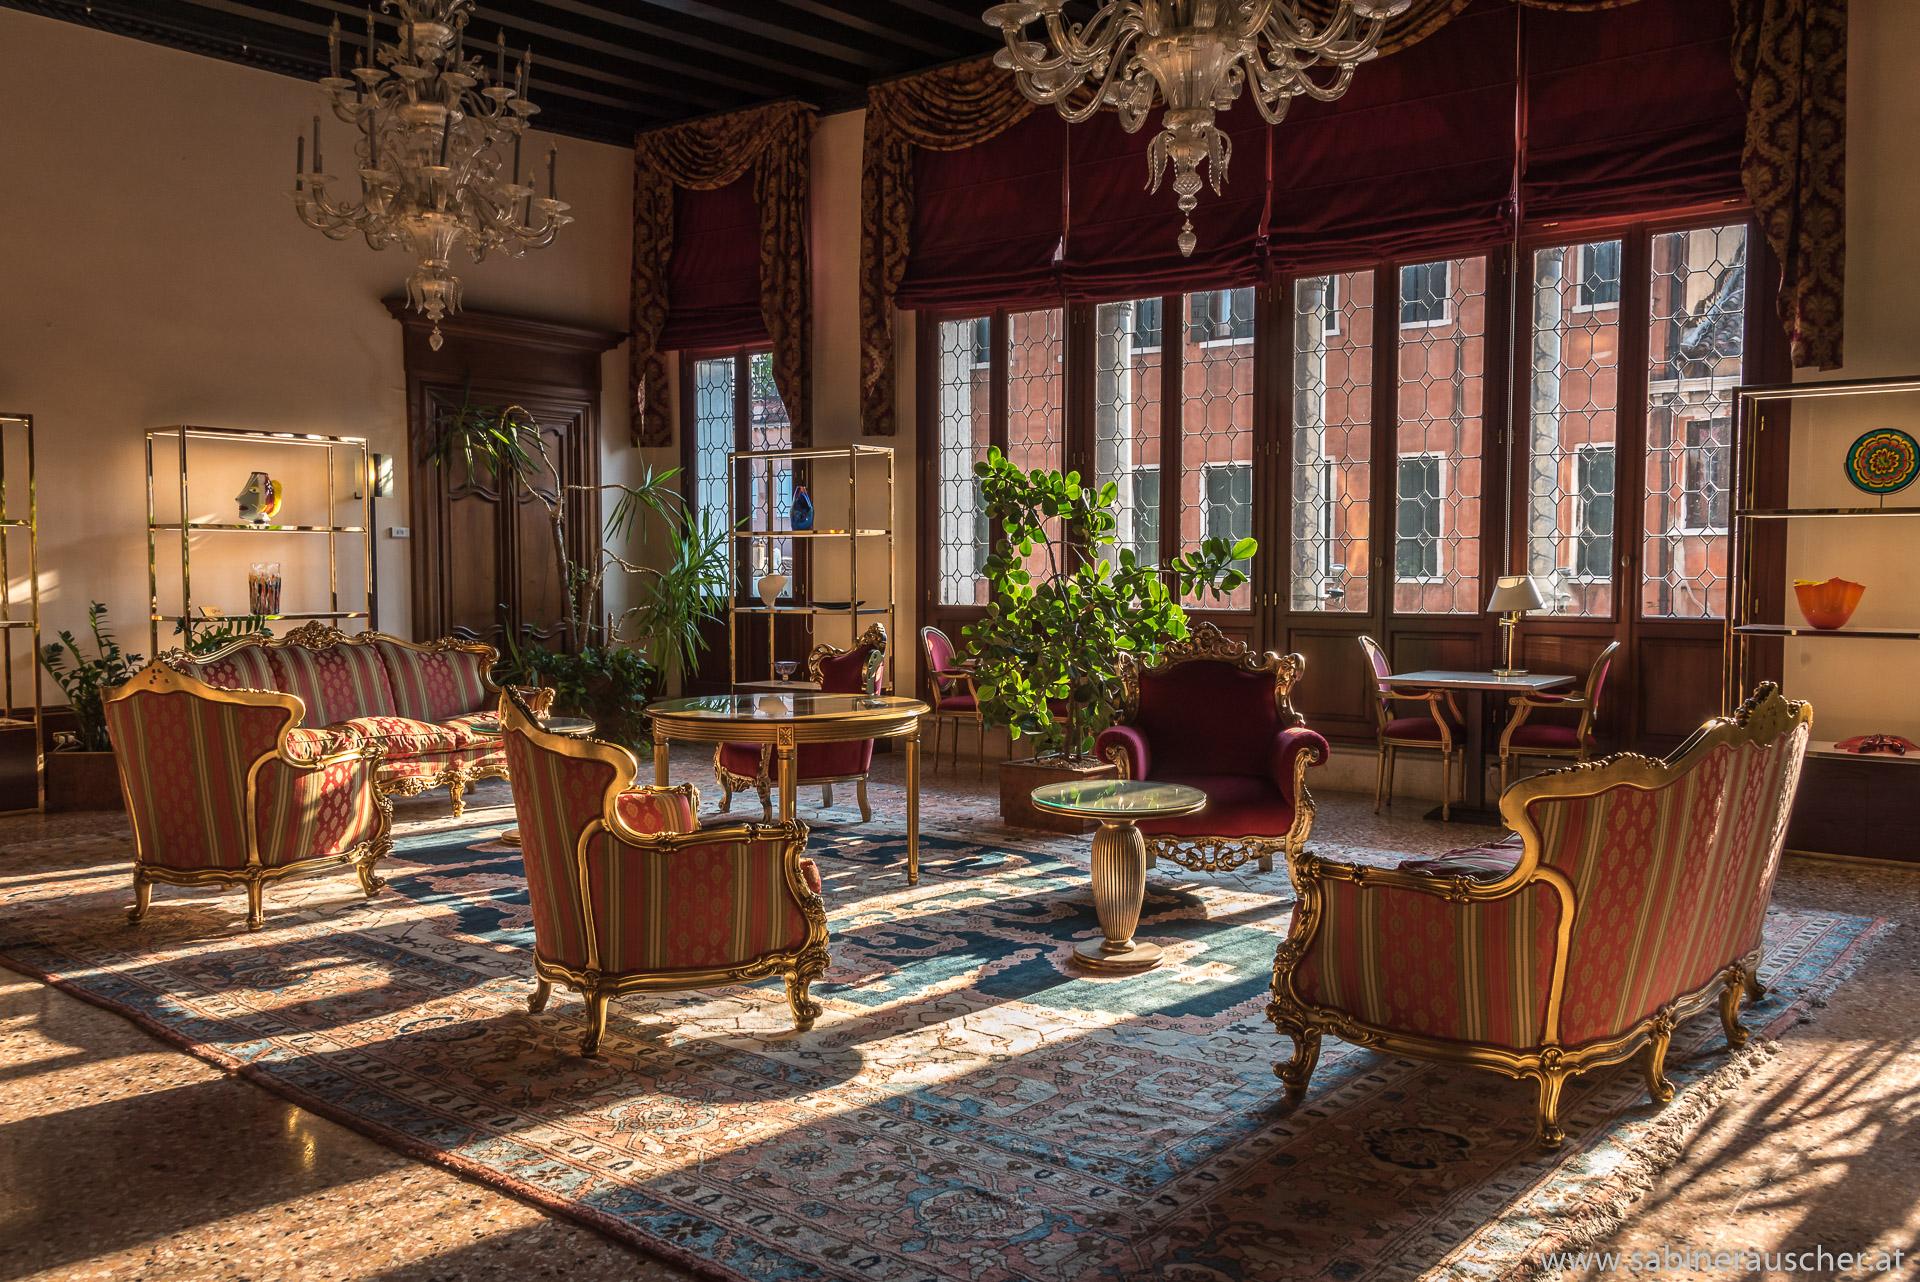 Venice - interior of Palazzo Liassidi | |Venedig - typische Einrichtung in venezianischem Palazzo